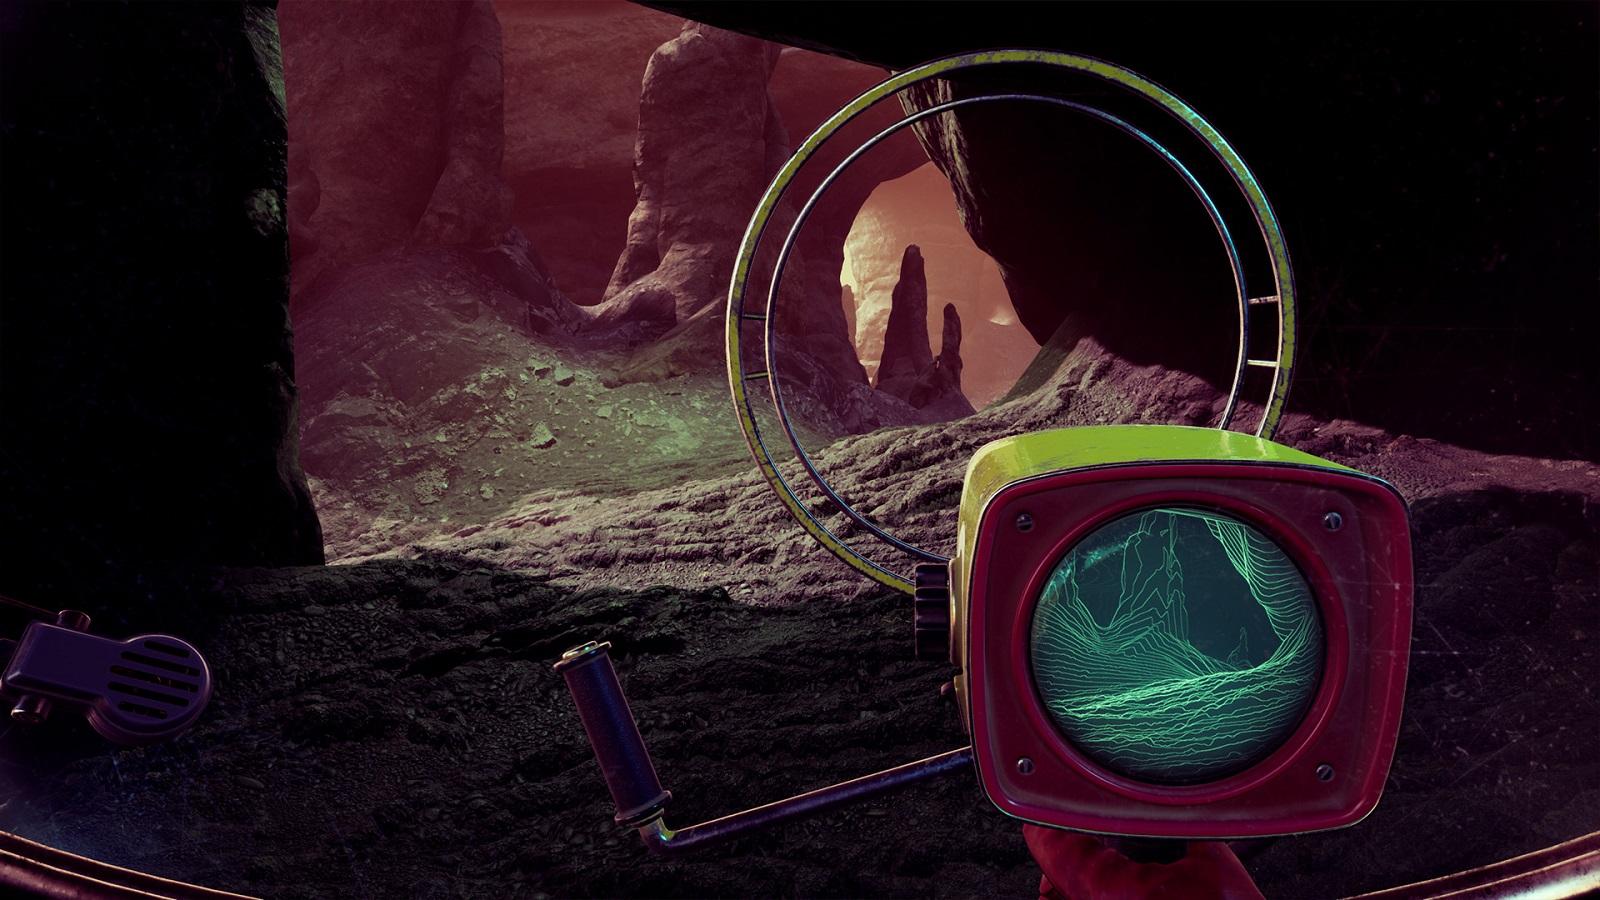 Бывшие сотрудники CD Projekt RED и Techland анонсировали приключение The Invincible по роману Станислава Лема - 02